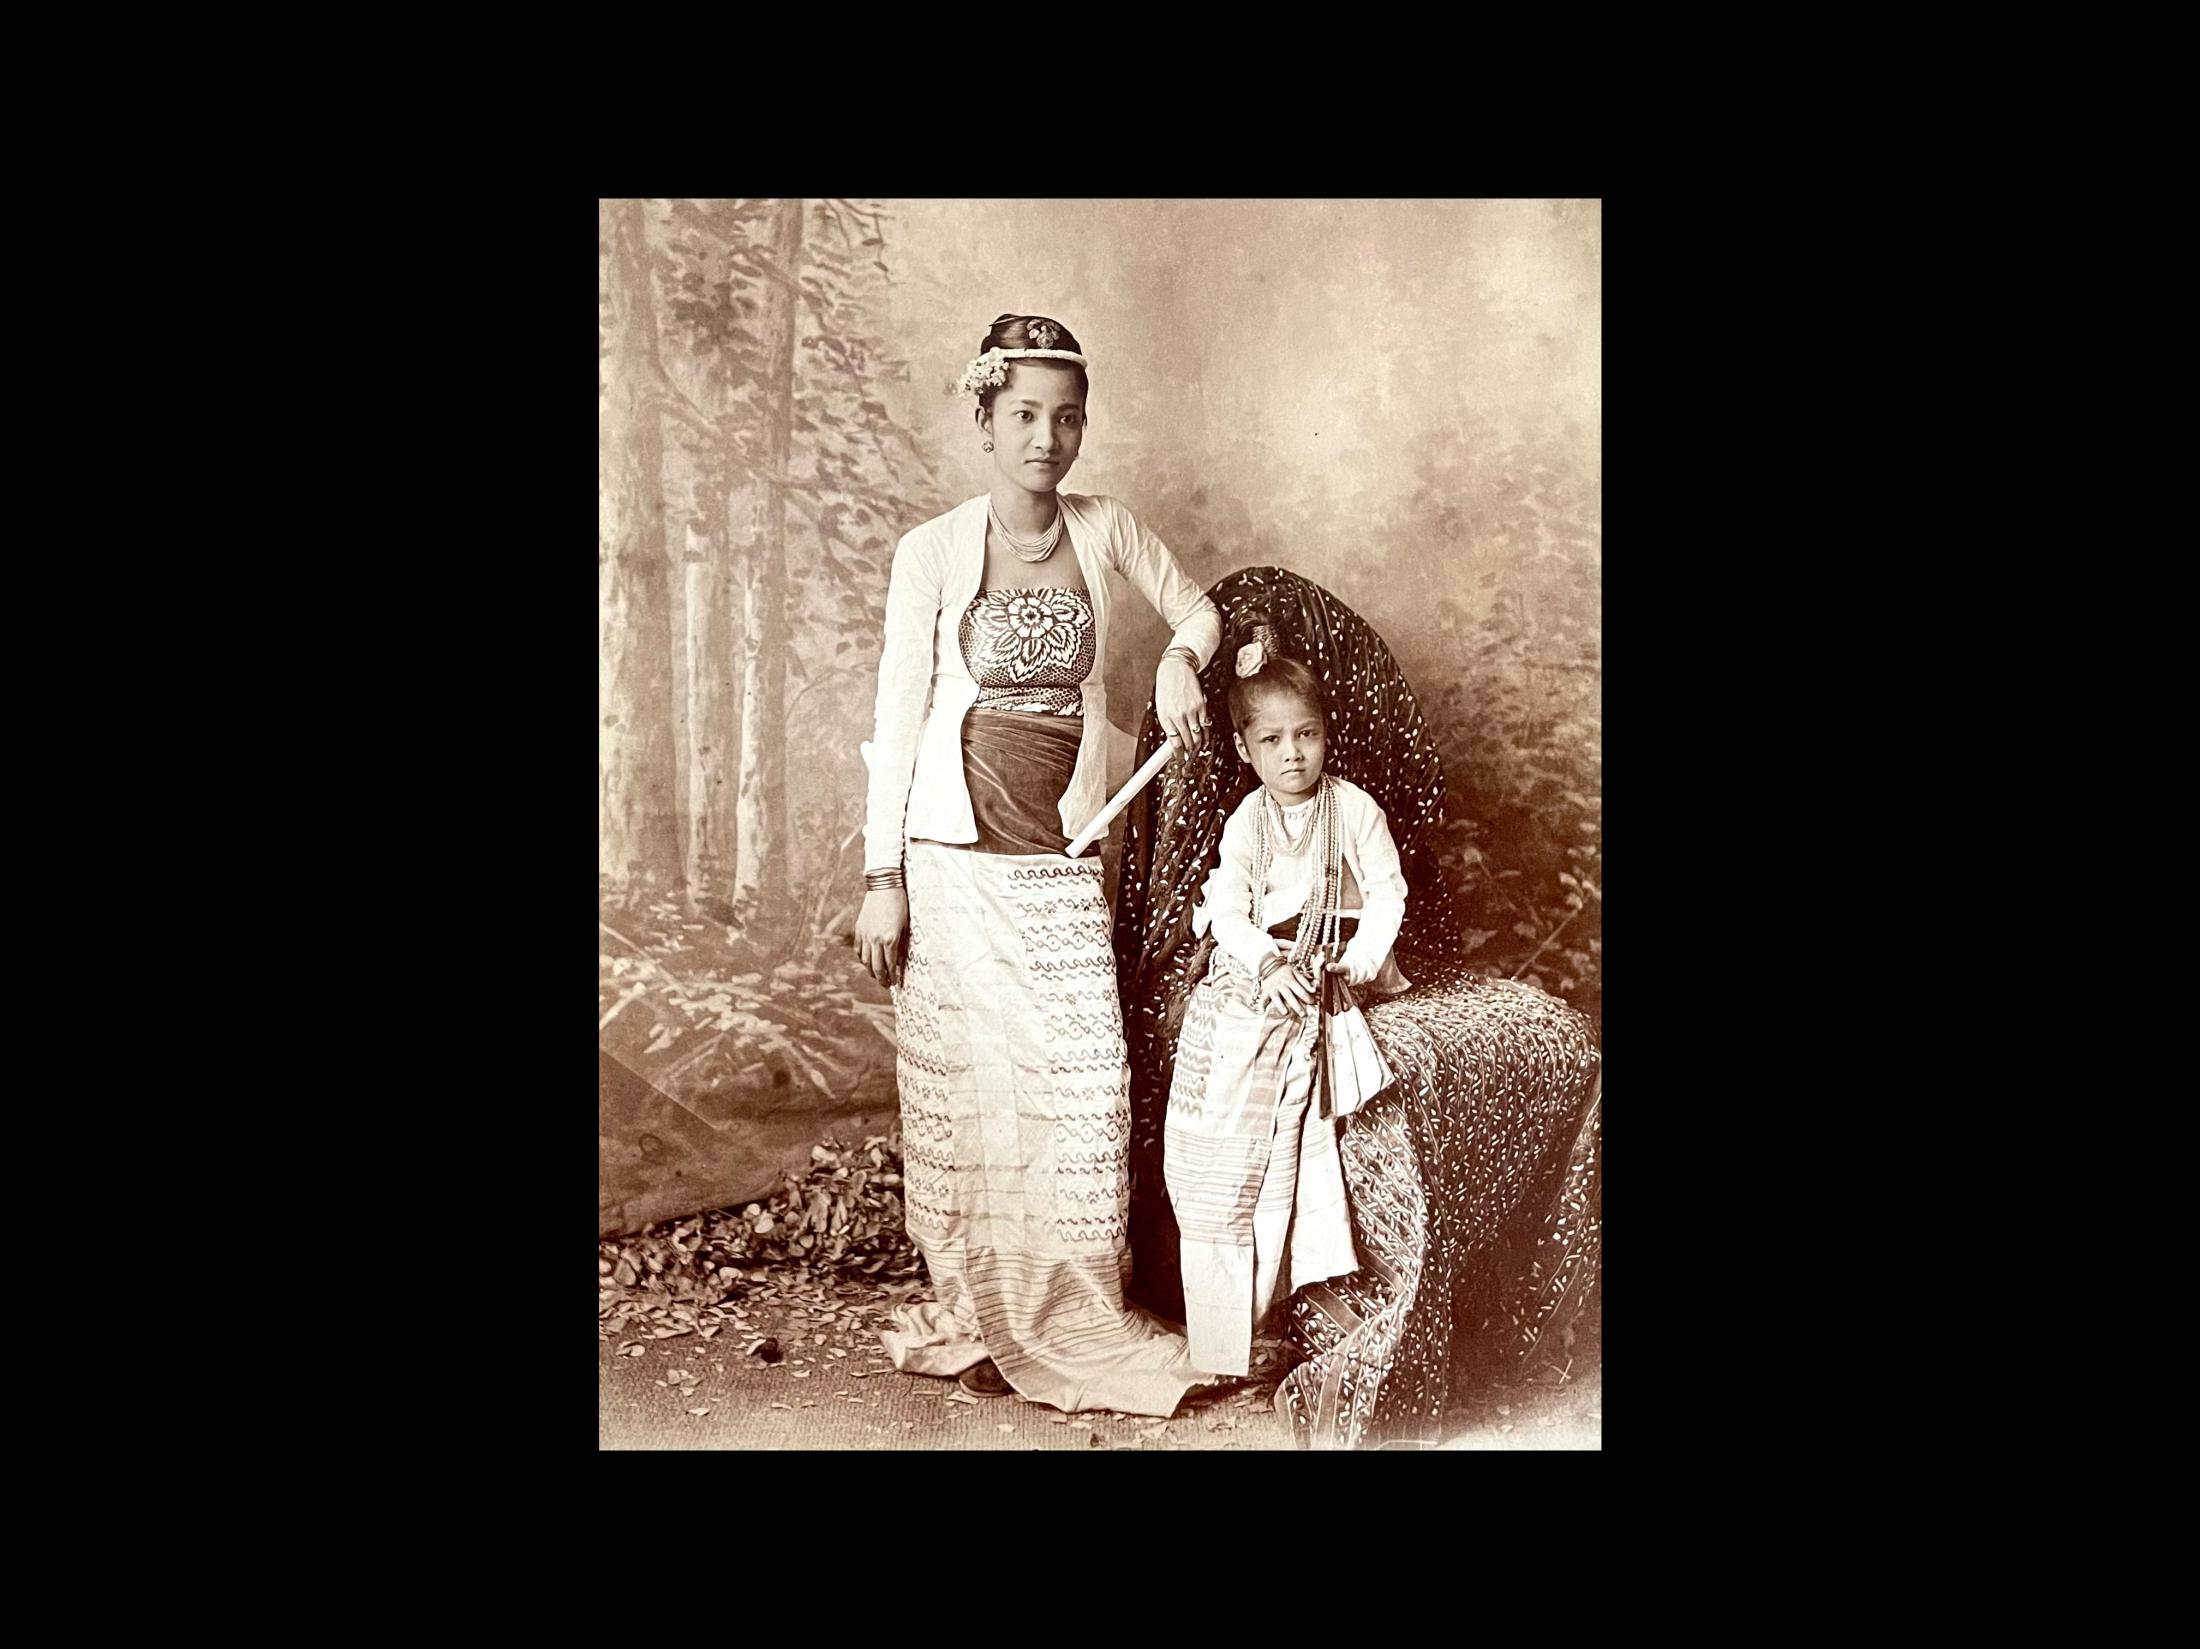 Mother and daughhter, Burma. 1895, photographer Felice Beato.